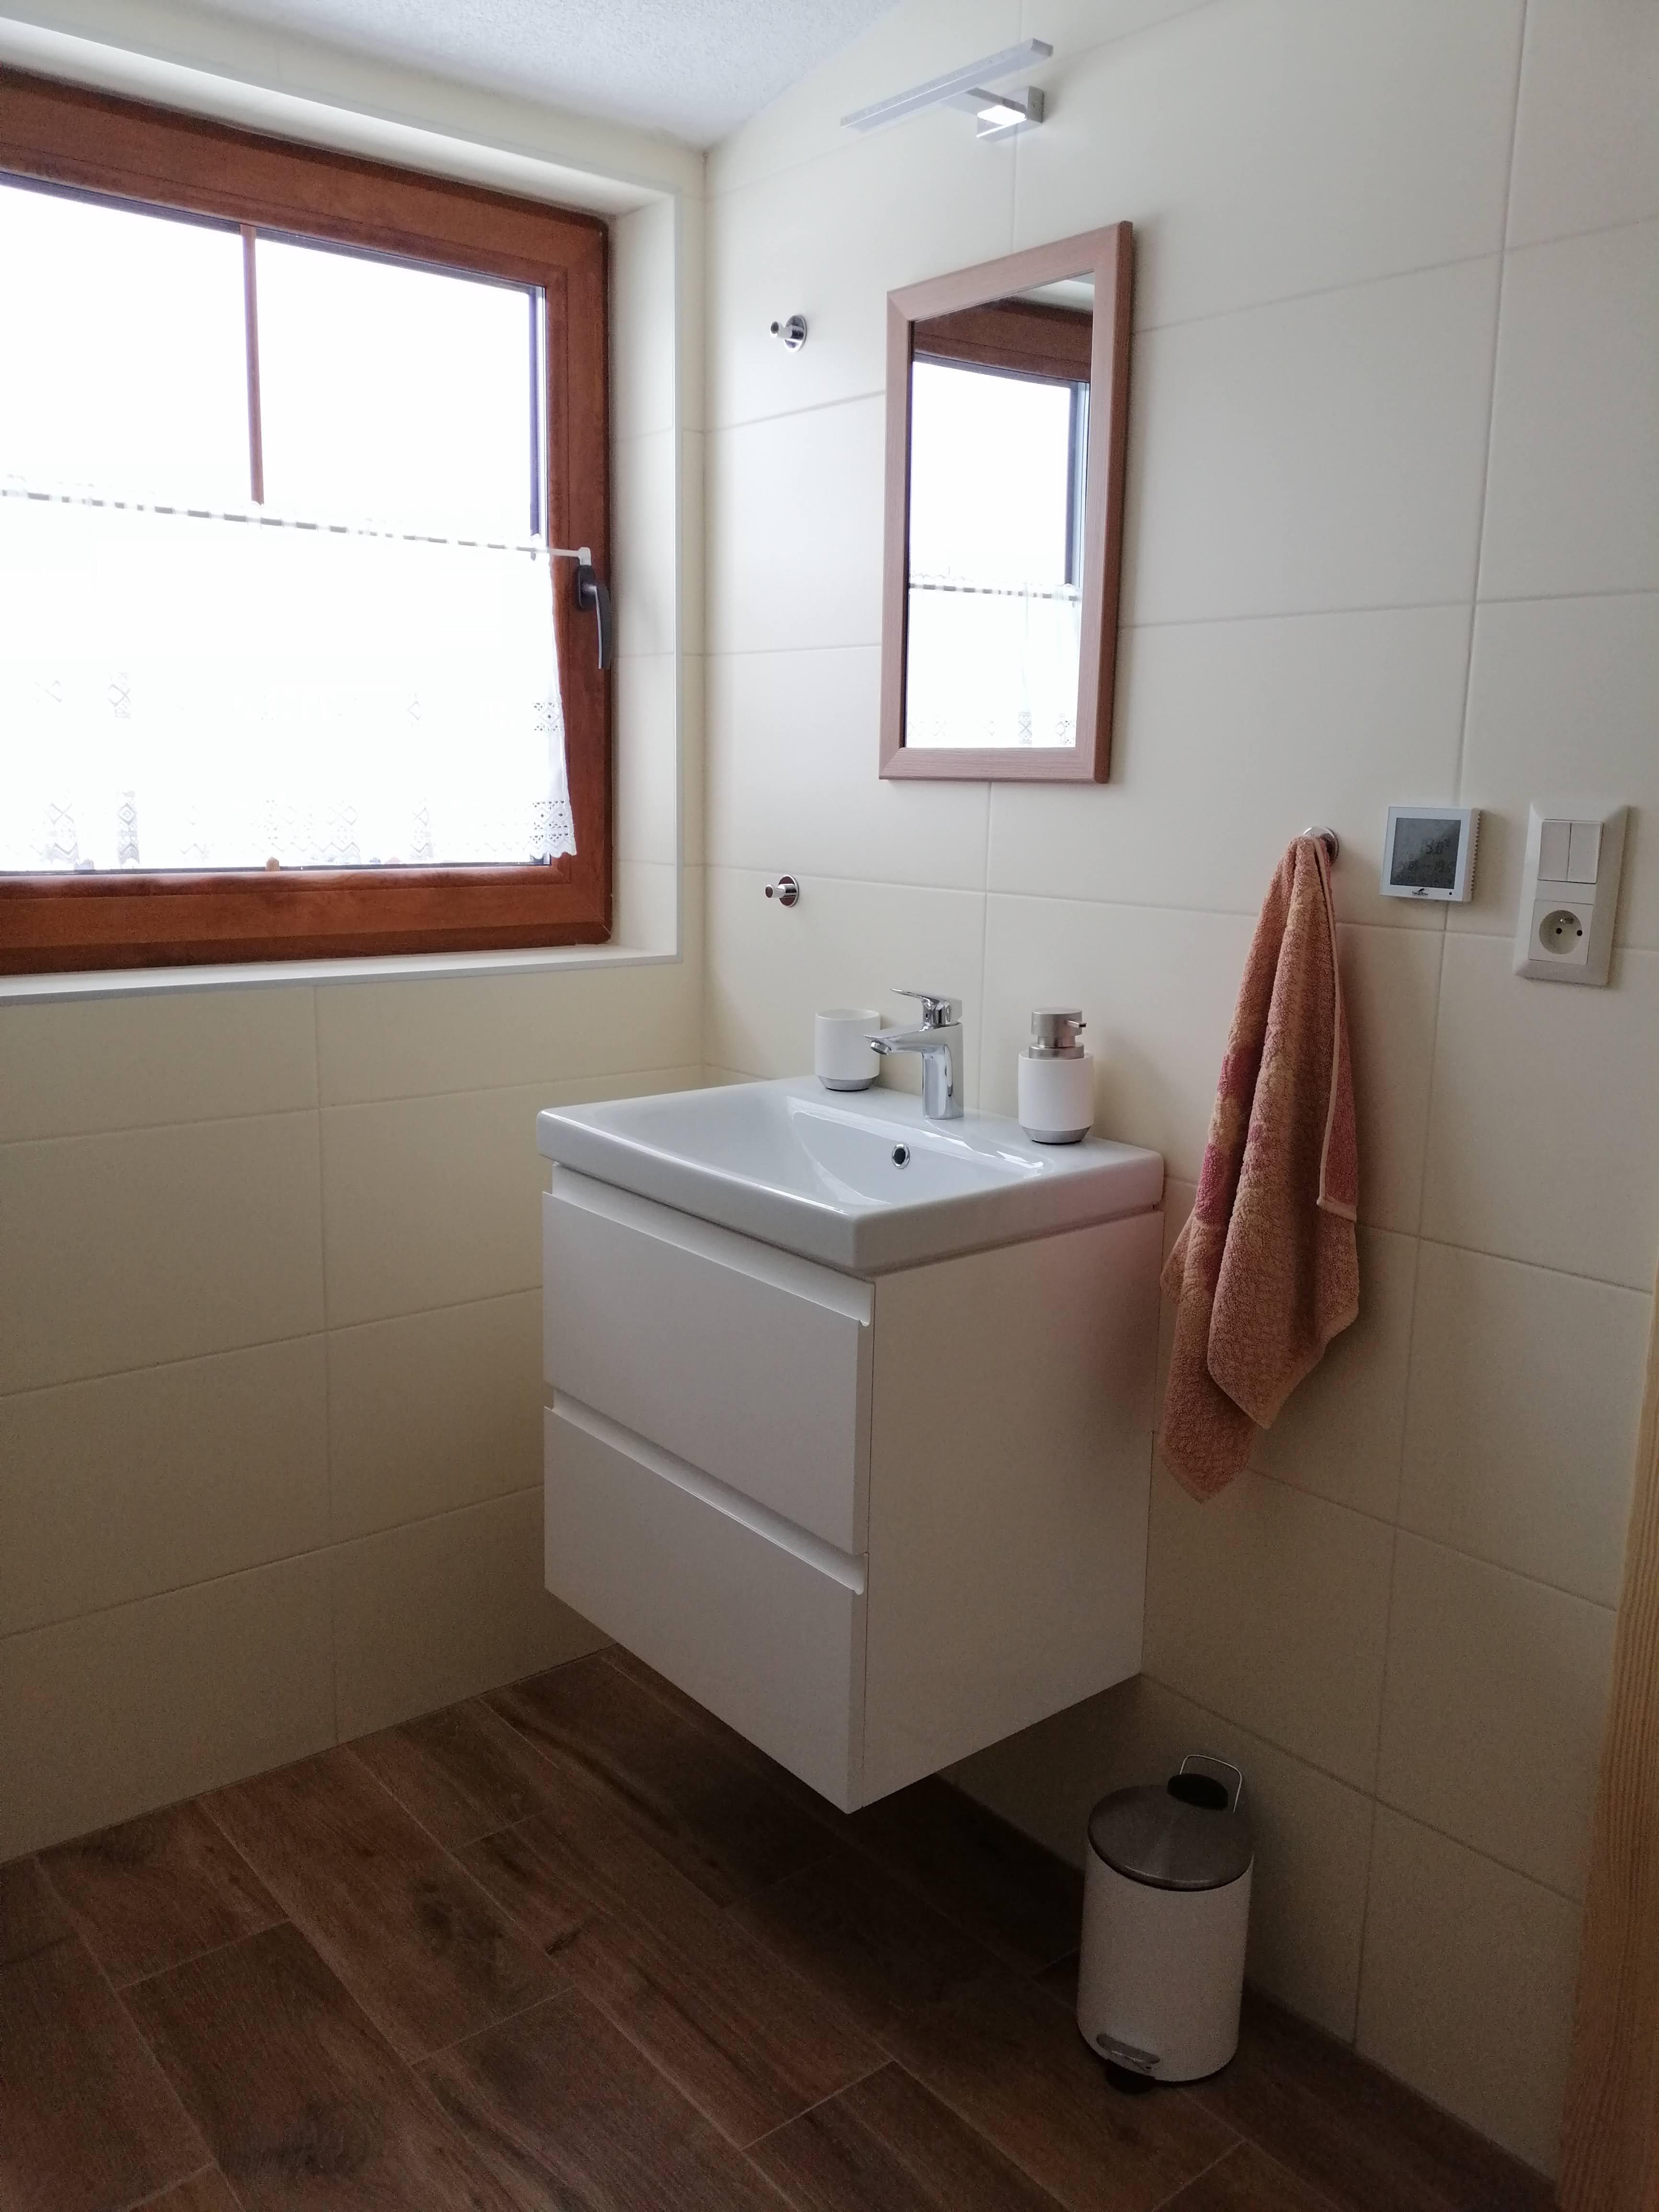 1618318370-Apartment-Sina-Bath-Room-03.jpg